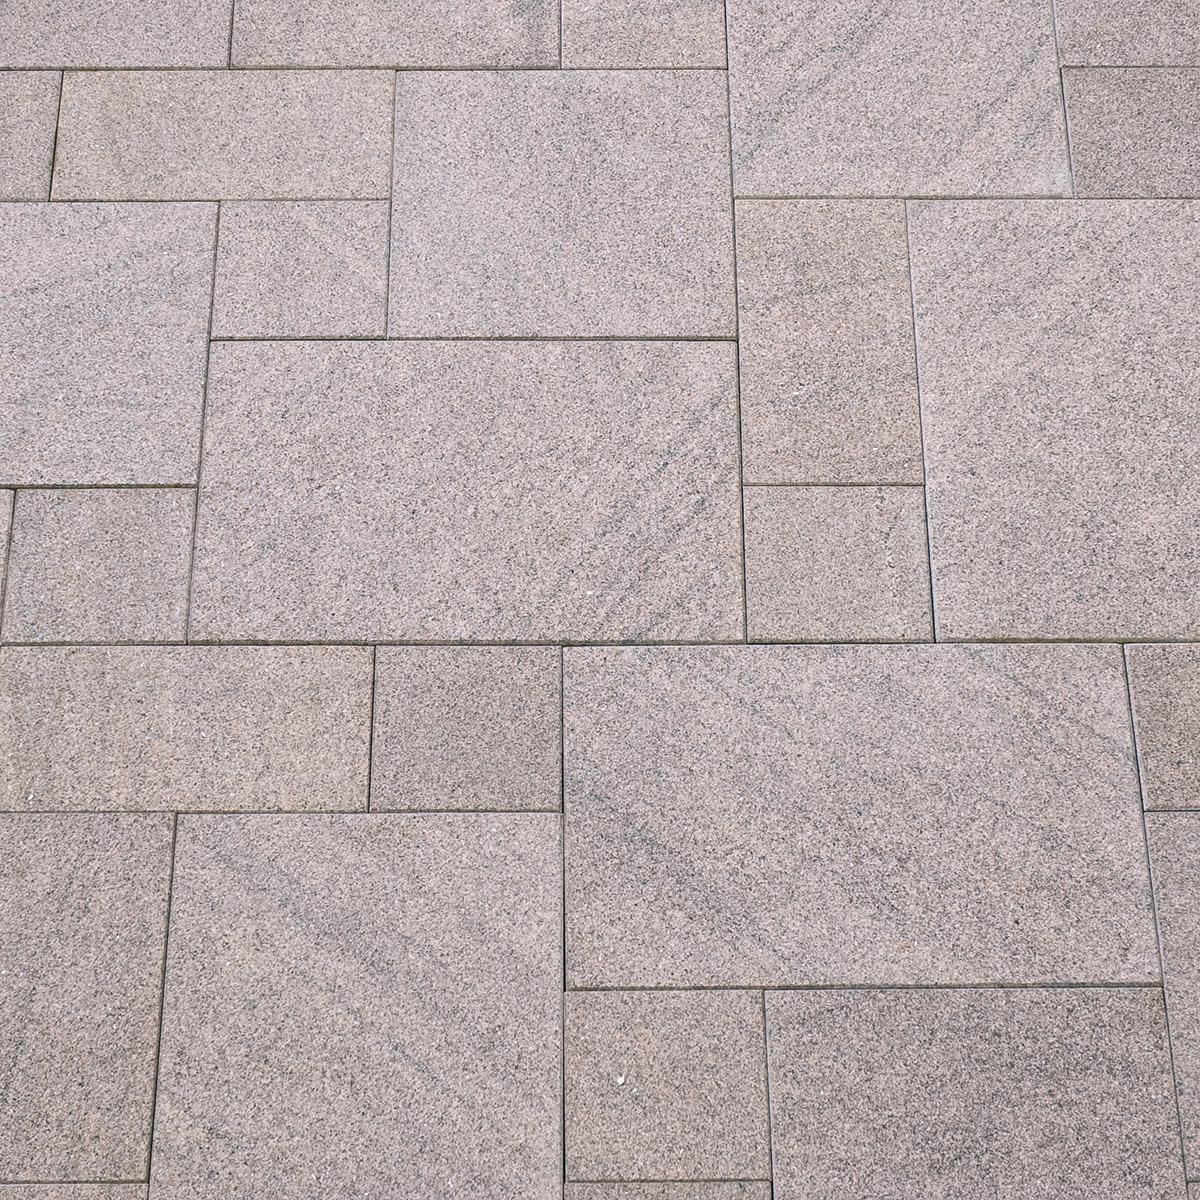 Terrassenplatten Granit Rotbrgeflammt Naturstein Baumaterial - Granit gartenplatten preise